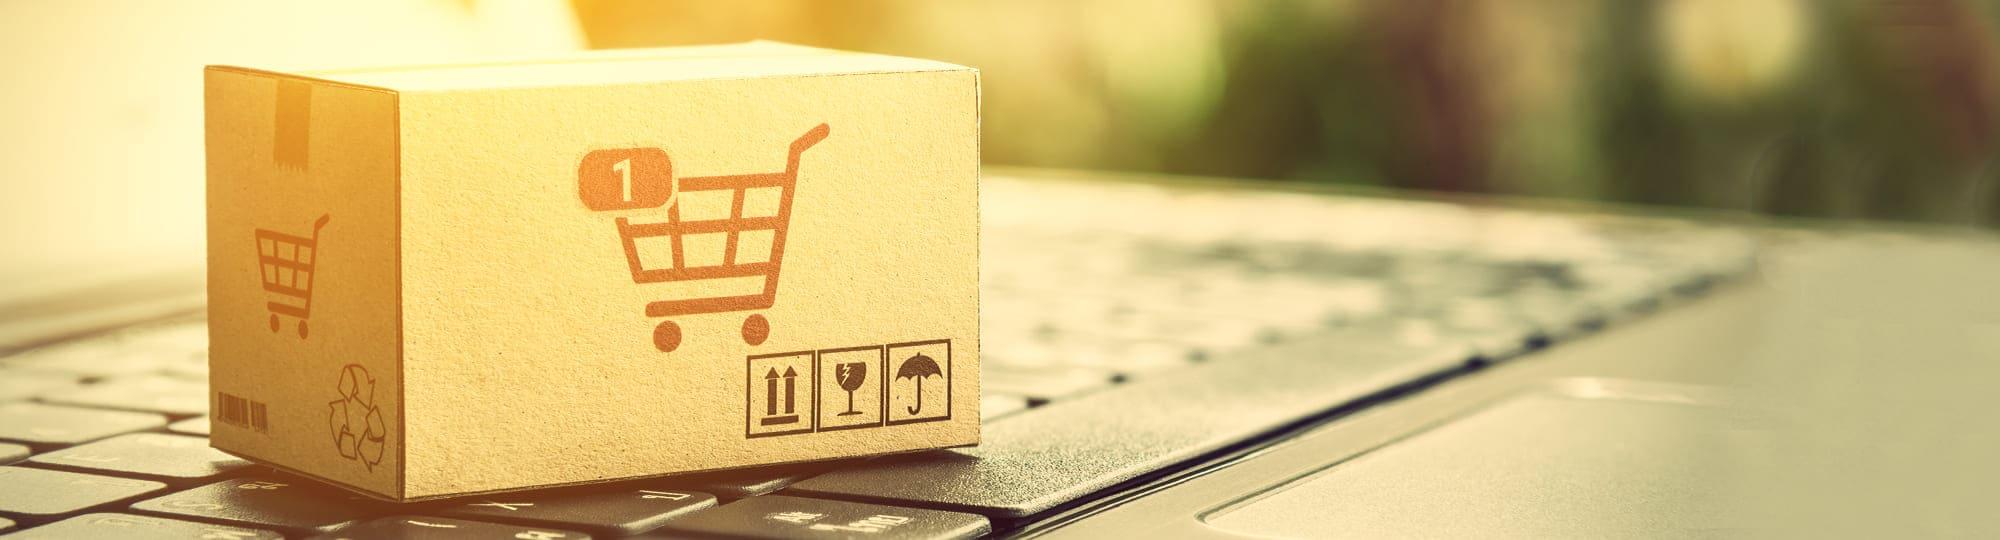 Shopify Store Development